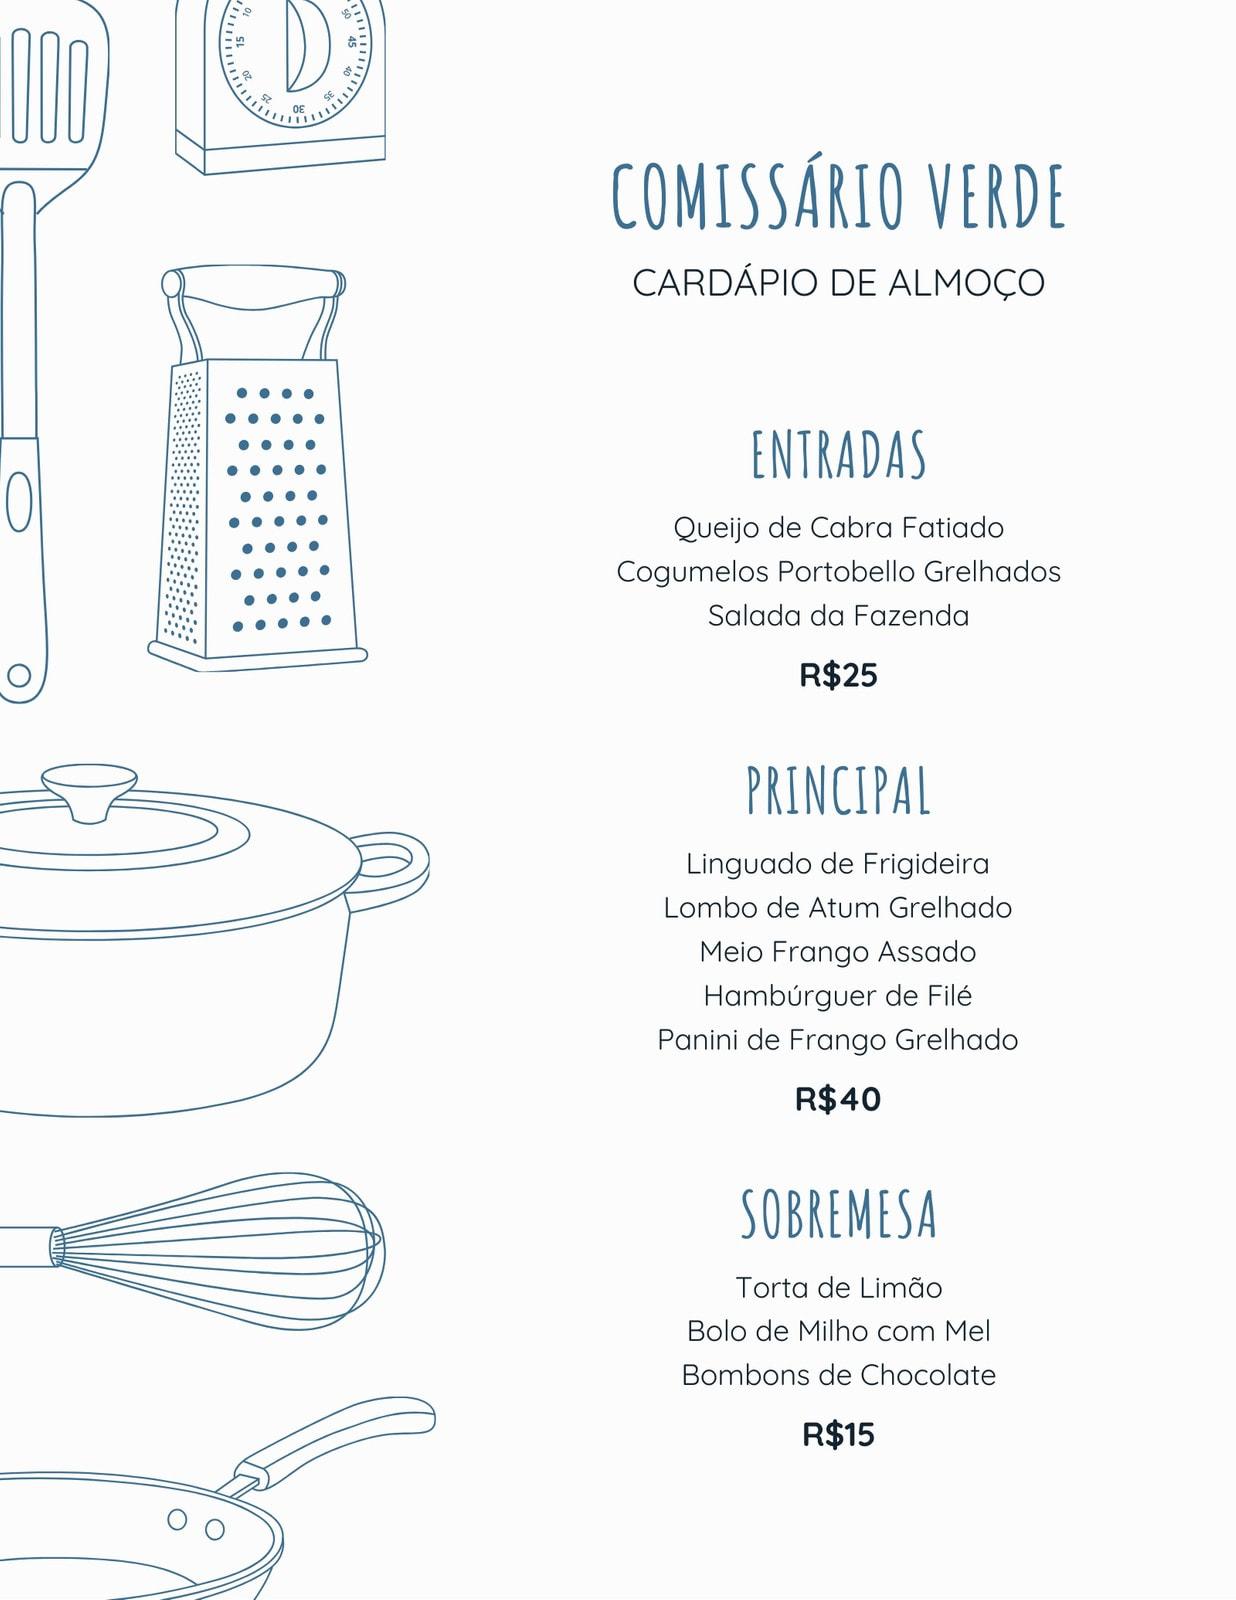 Azul Minimalista Utensílios de Cozinha Ilustração Almoço Cardápio